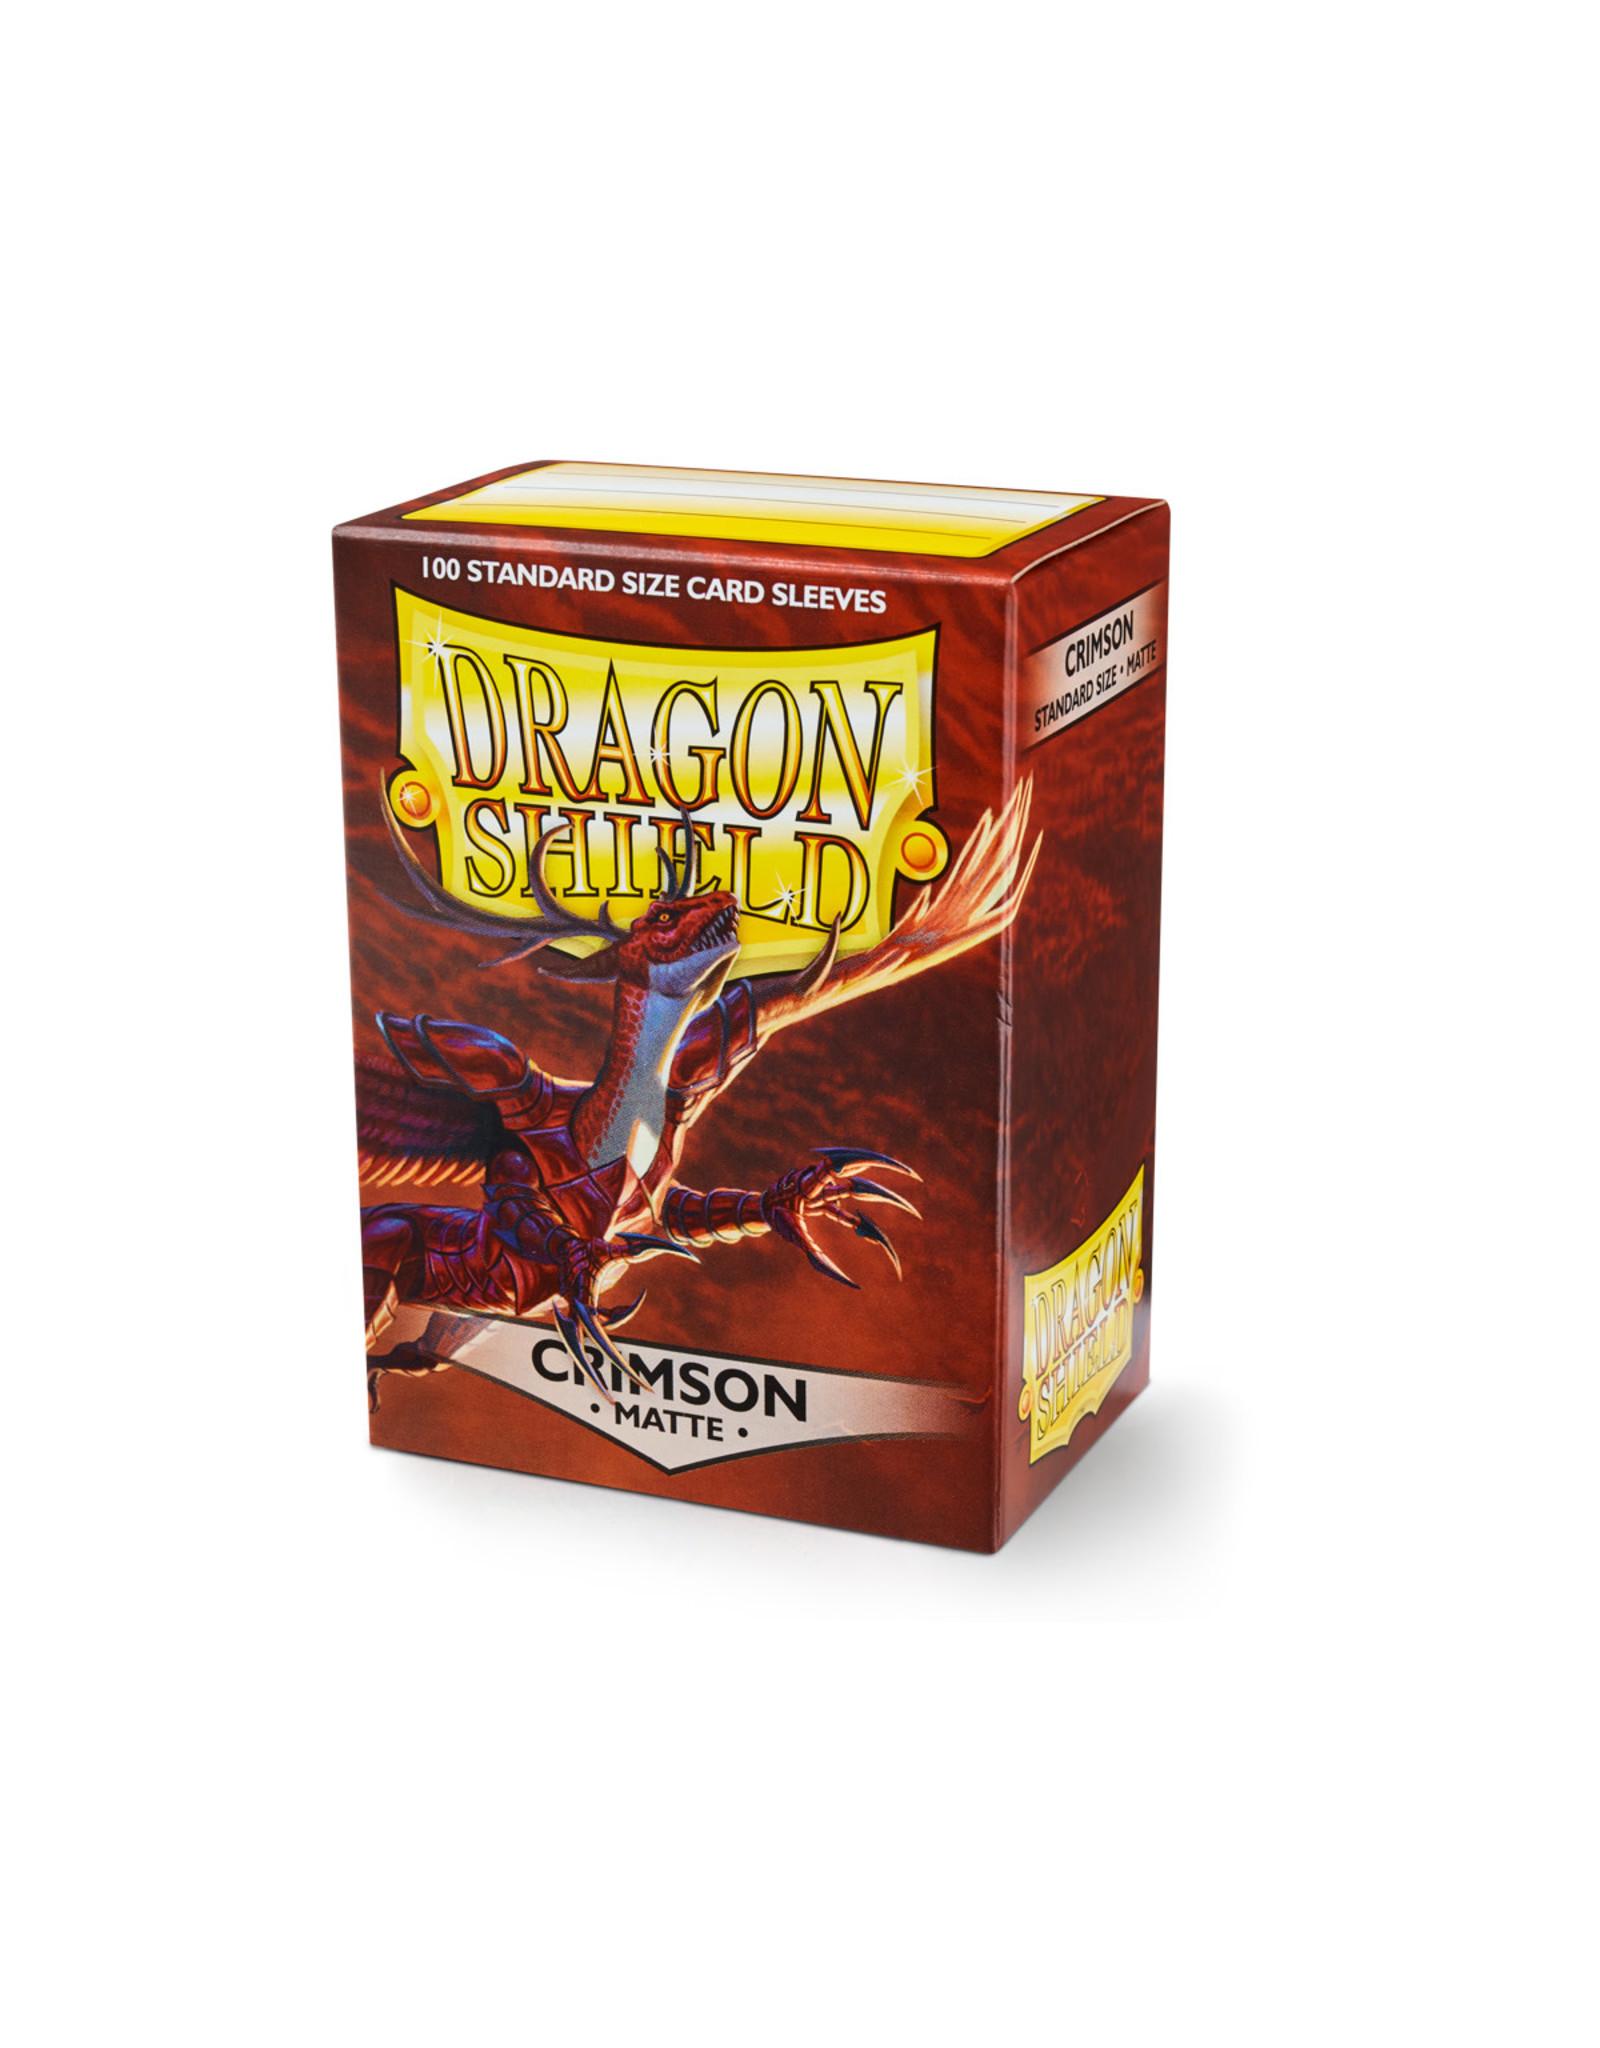 Arcane Tinmen Dragon Shield: Matte Crimson Card Sleeves 100 Count